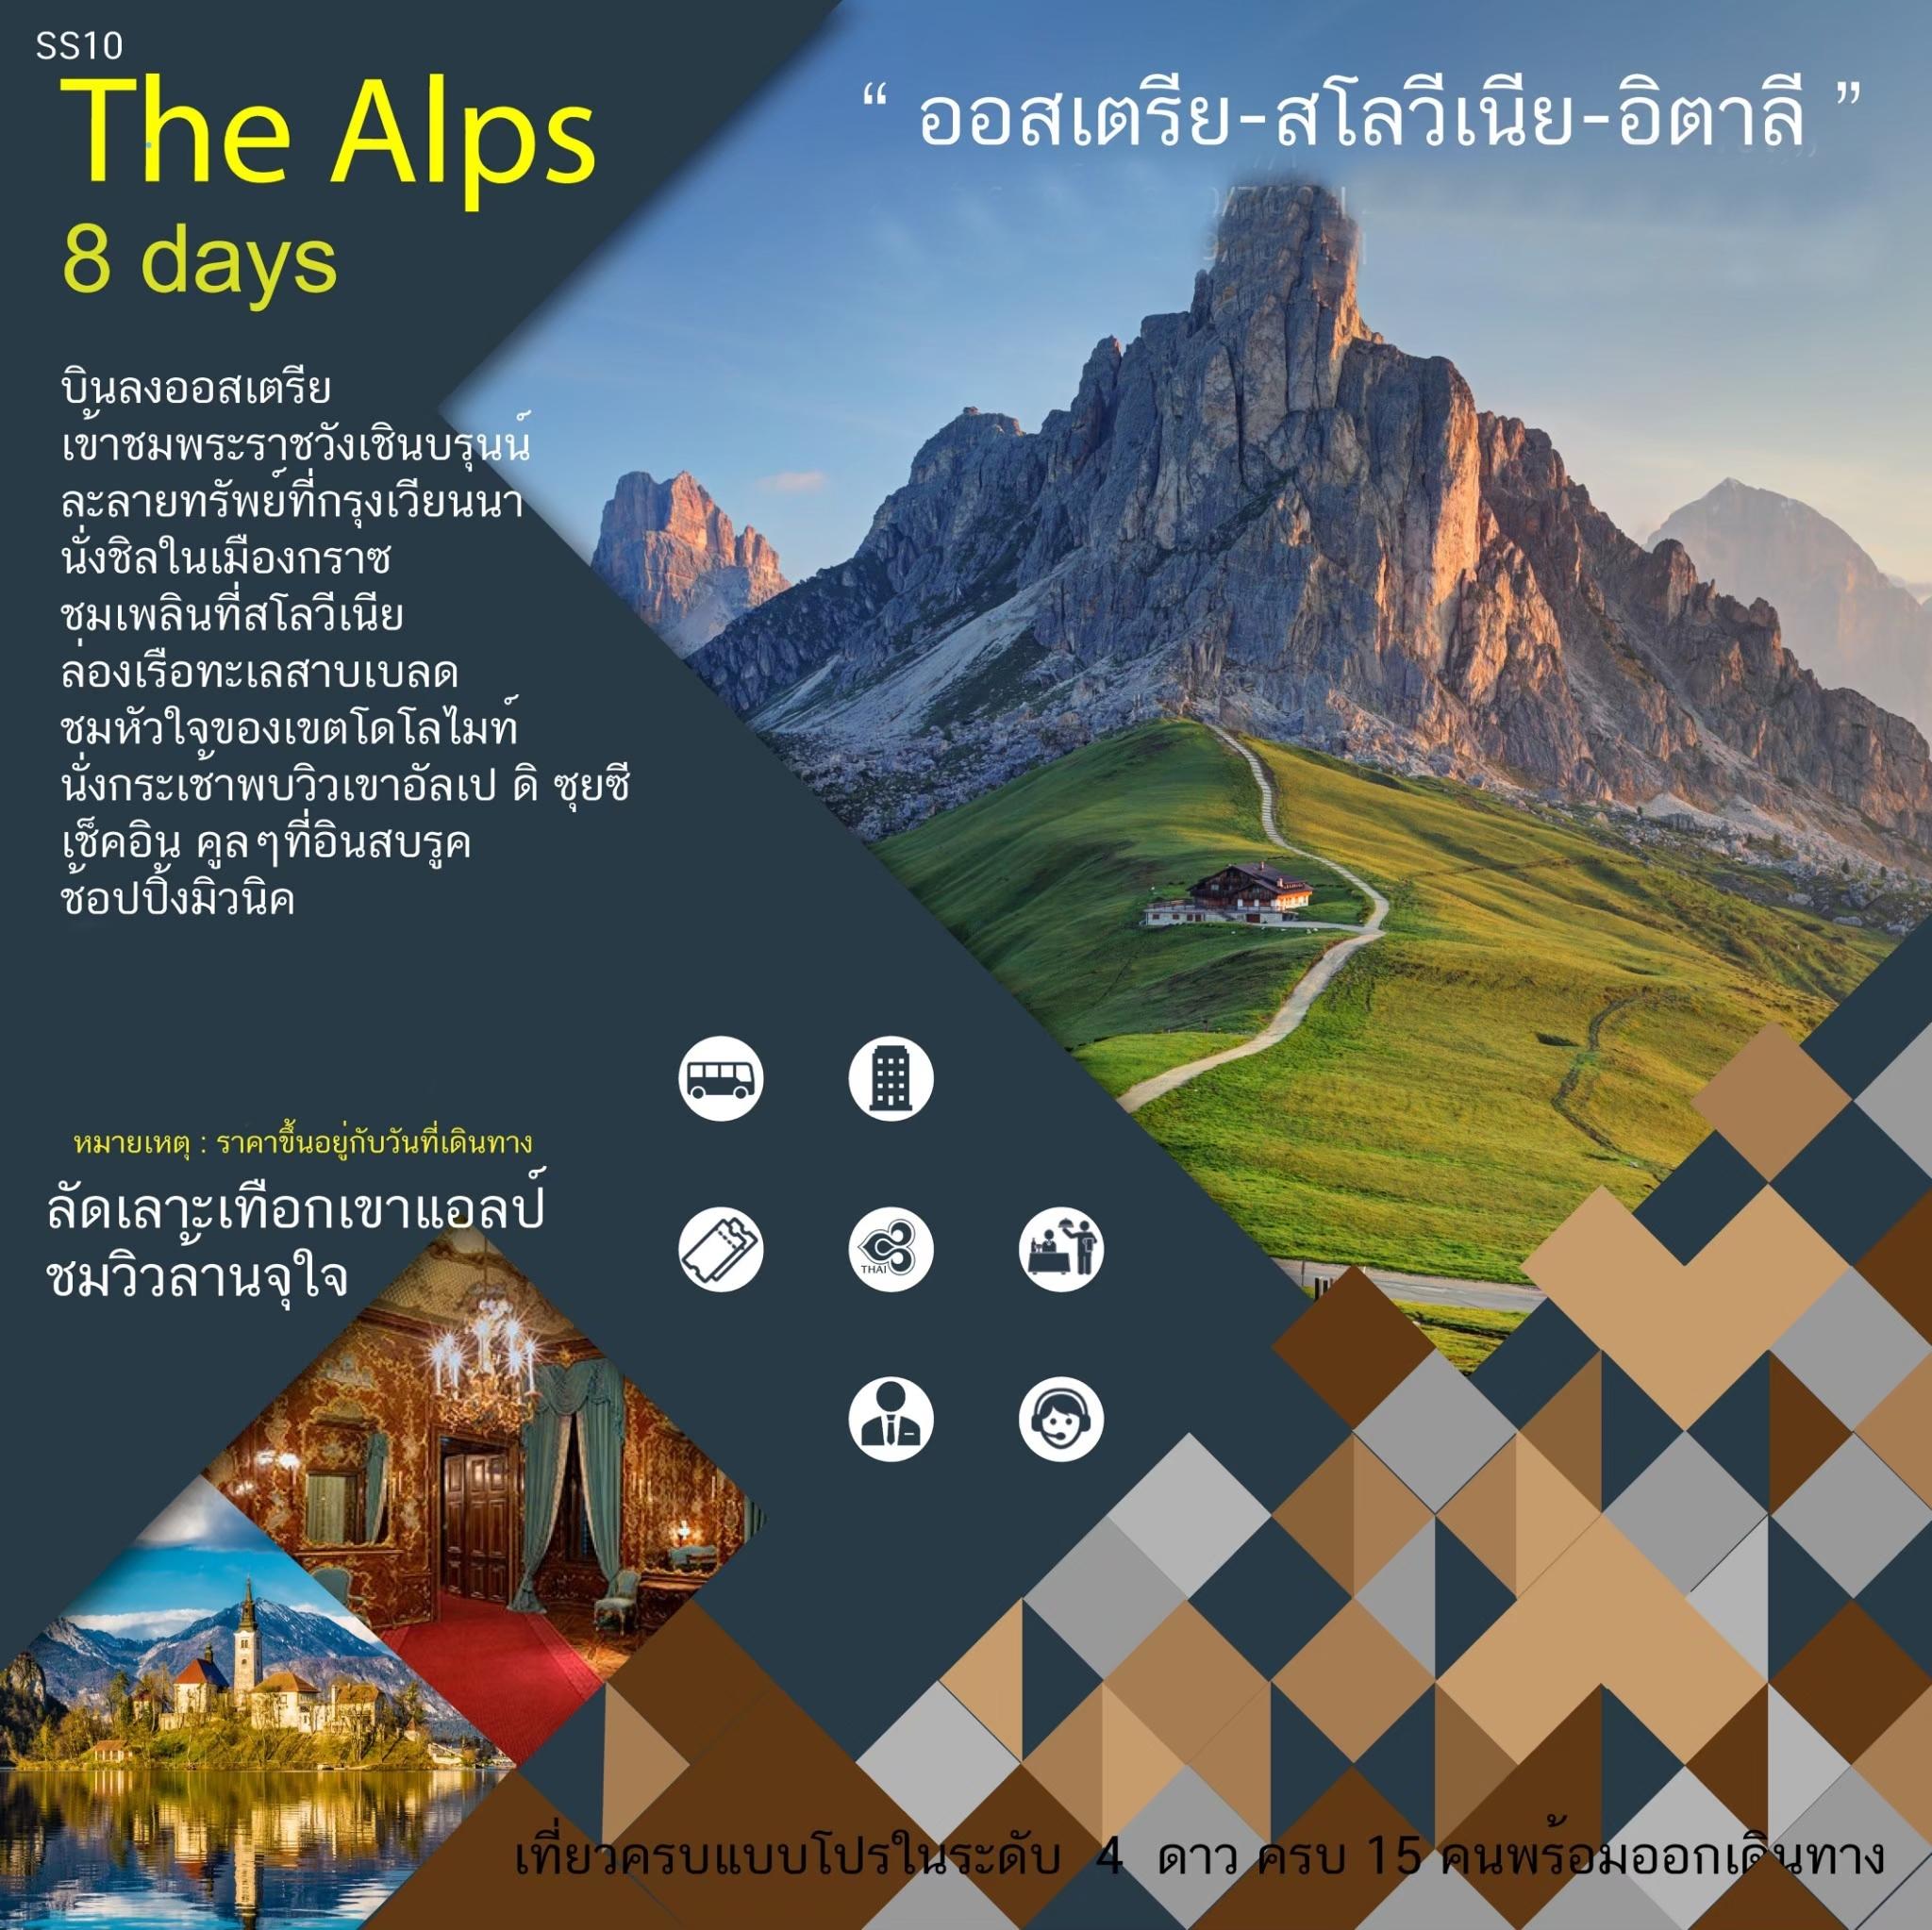 SMART_The Alps